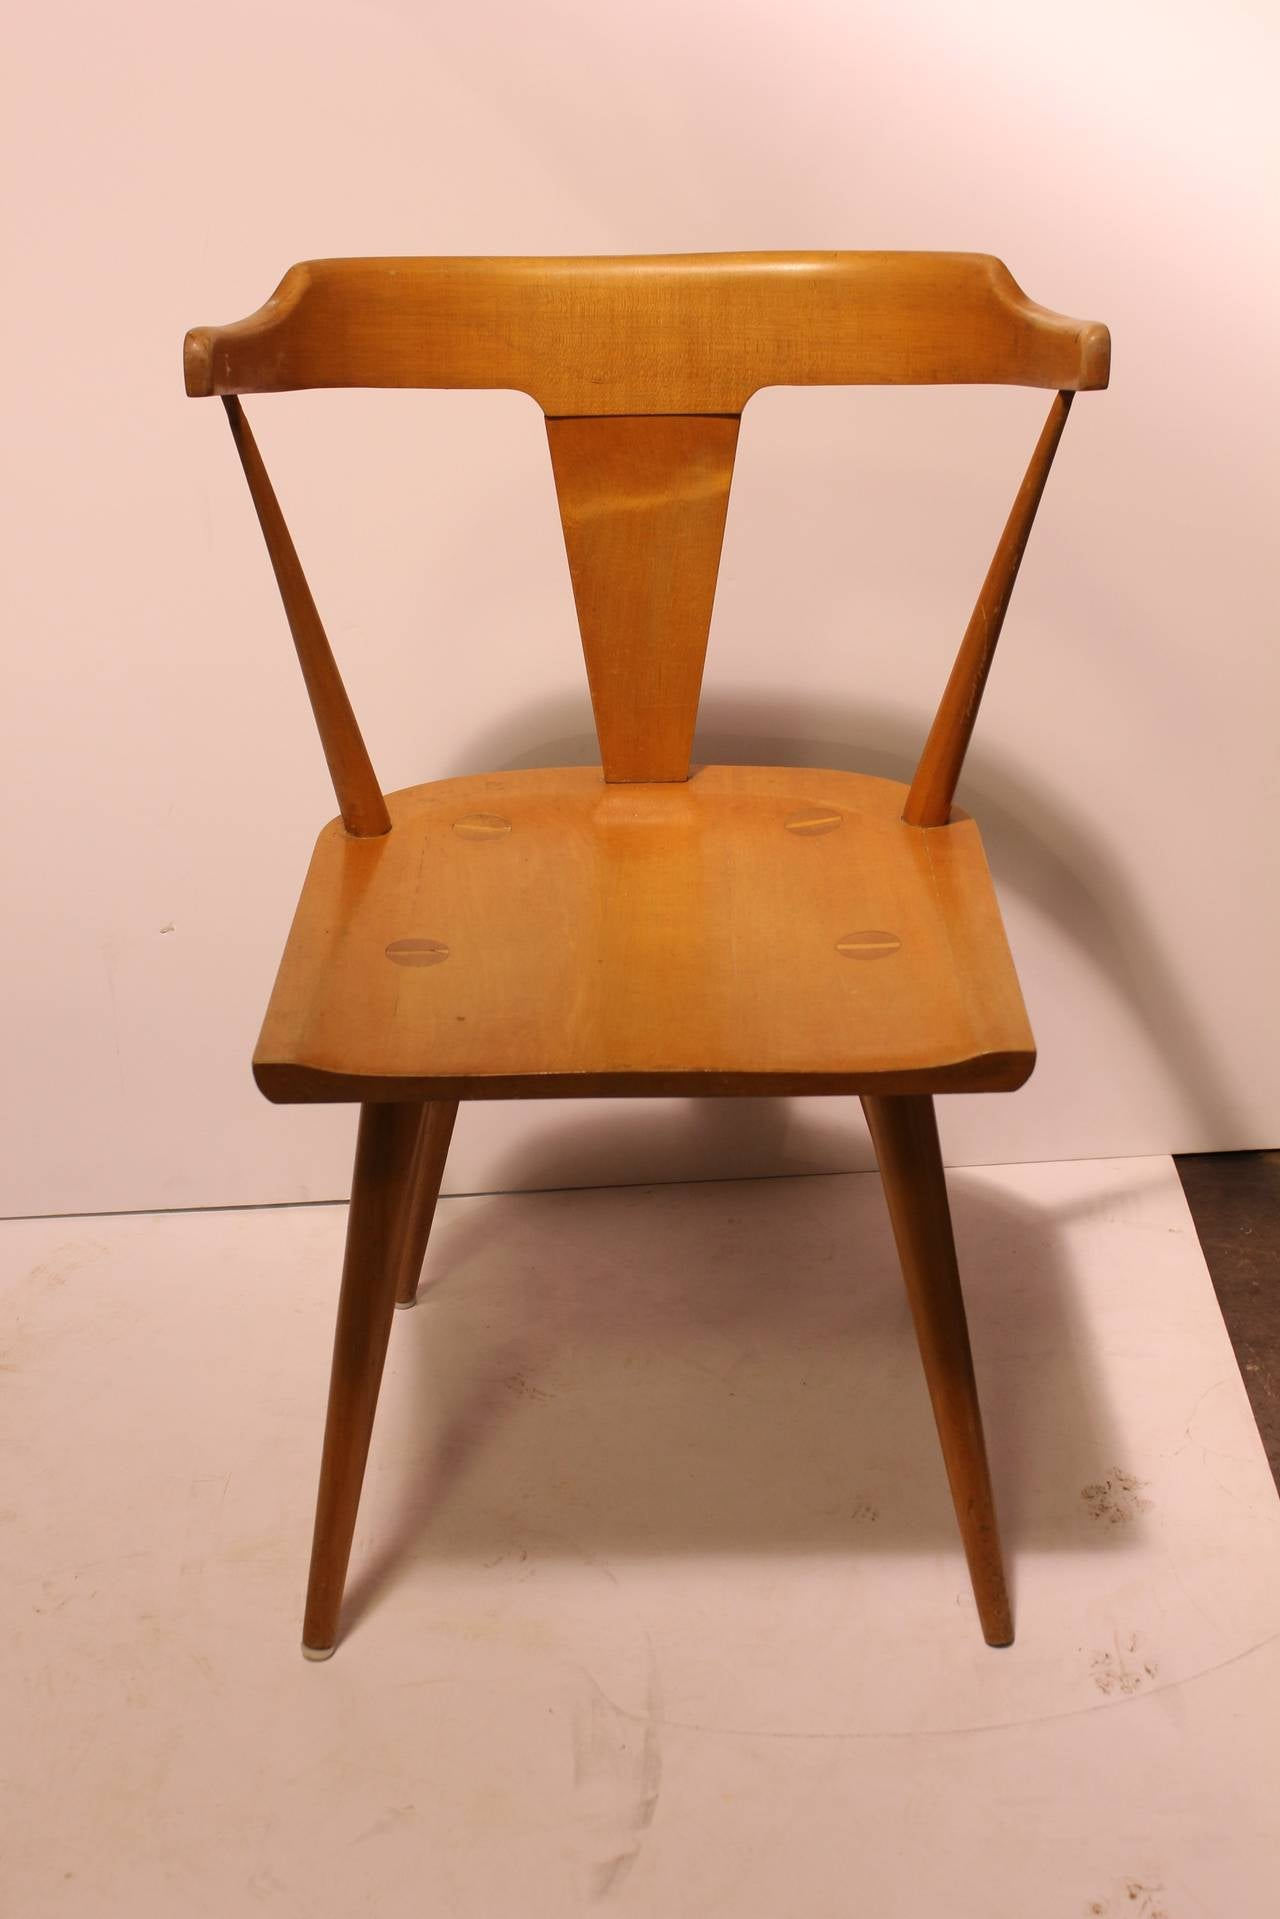 Stylish mid century Paul McCobb Planner group desk/side chair.